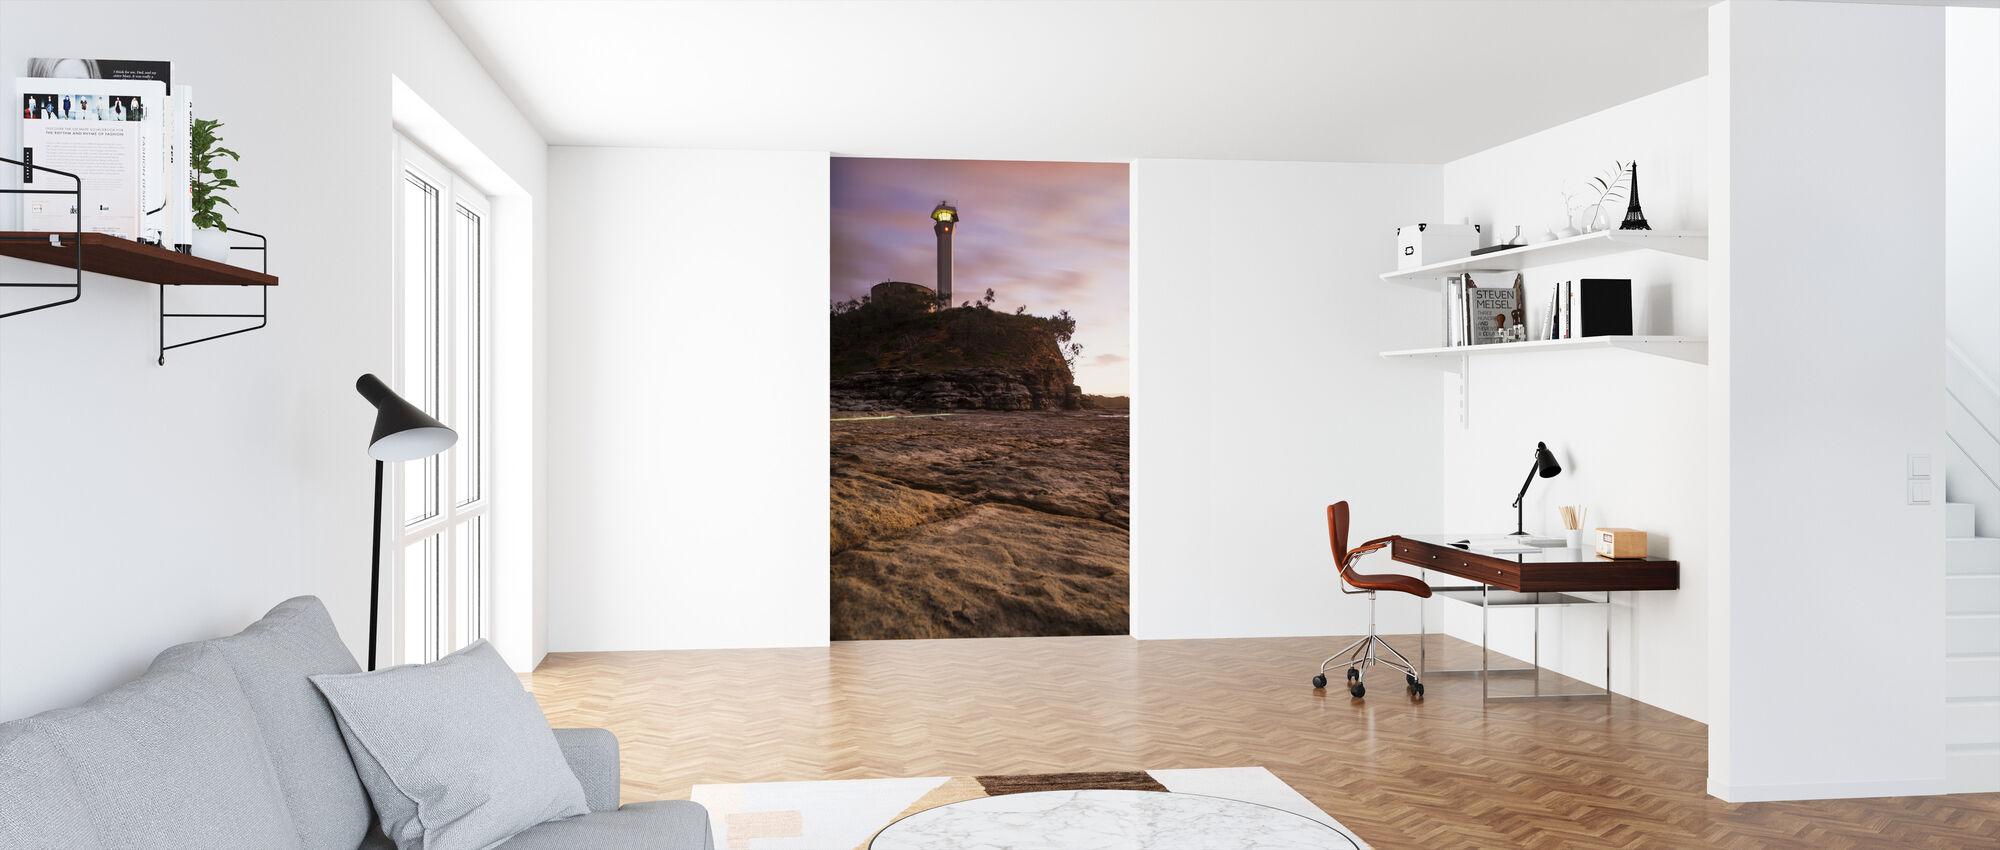 Mooloolaba Lighthouse, Australia - Wallpaper - Office